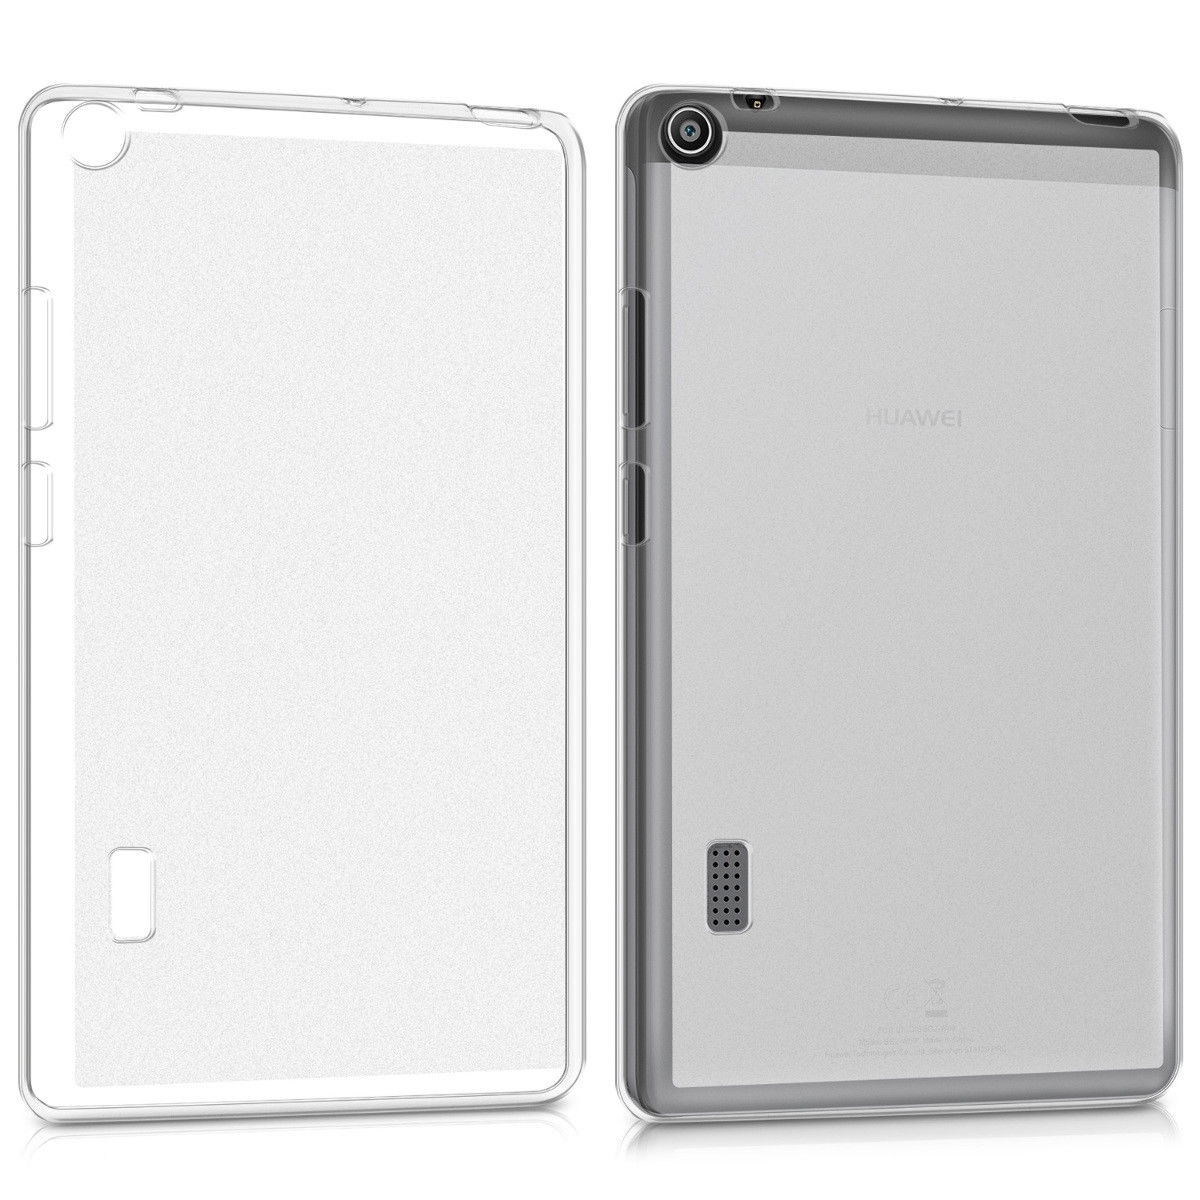 Pouzdro GEL pro Huawei MediaPad T3 7.0